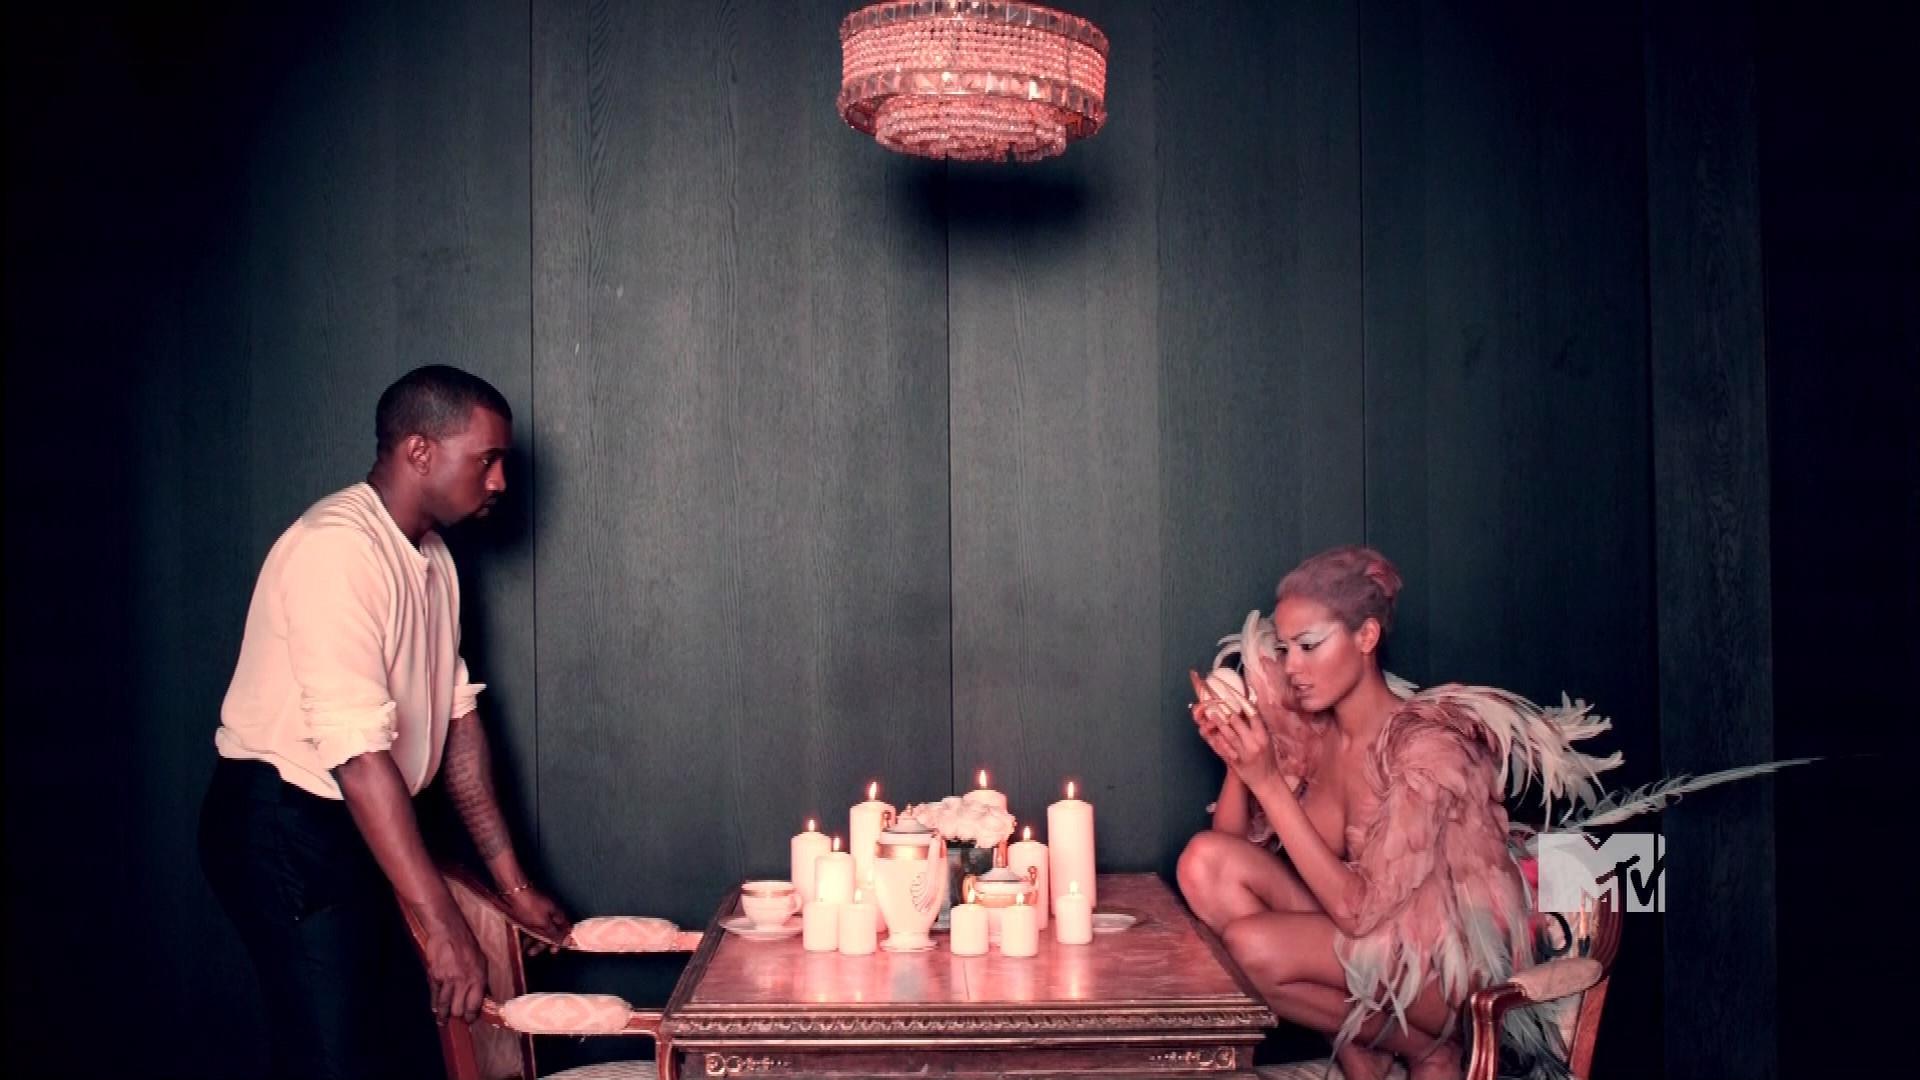 Kanye West Runaway Wallpaper 1080p As Wallpaper HD